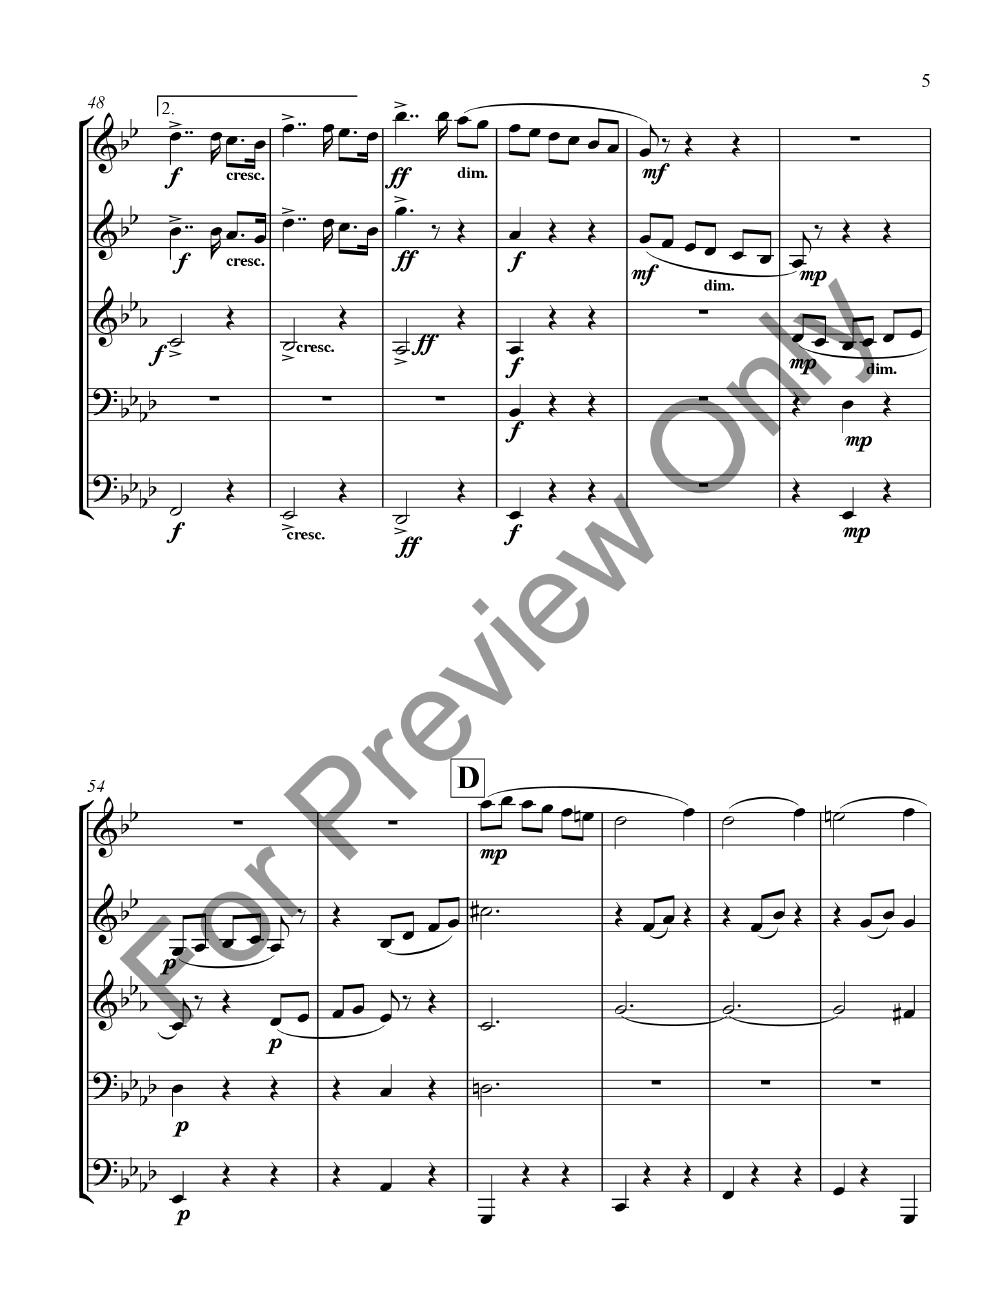 Serenade for Strings Movement 2 Thumbnail